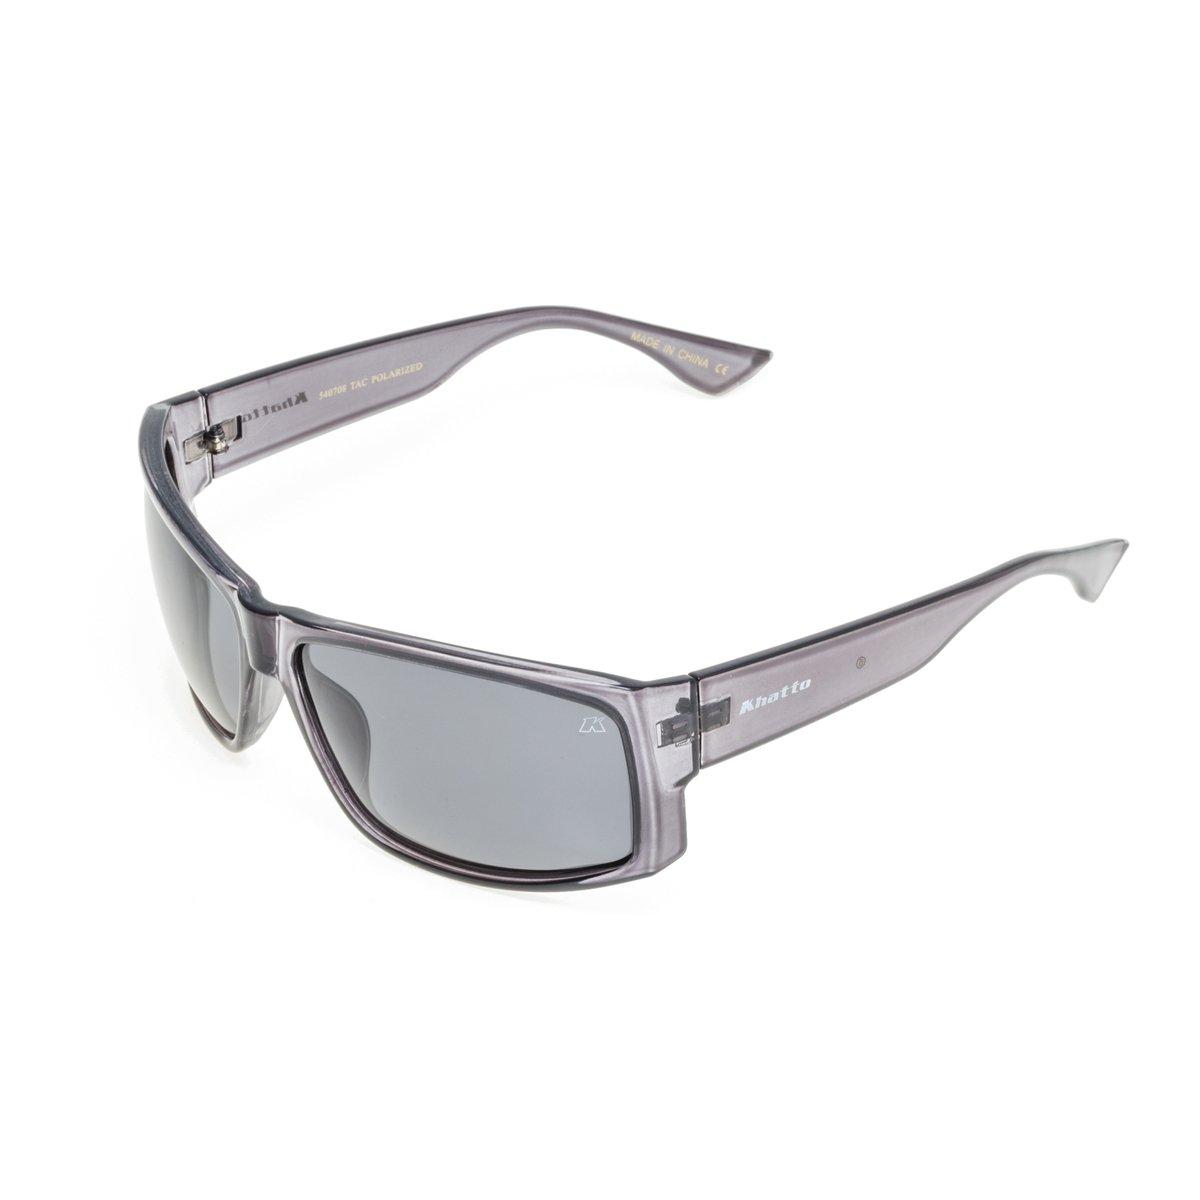 Óculos de Sol Khatto KT540708 - Compre Agora   Netshoes f59e41bc71